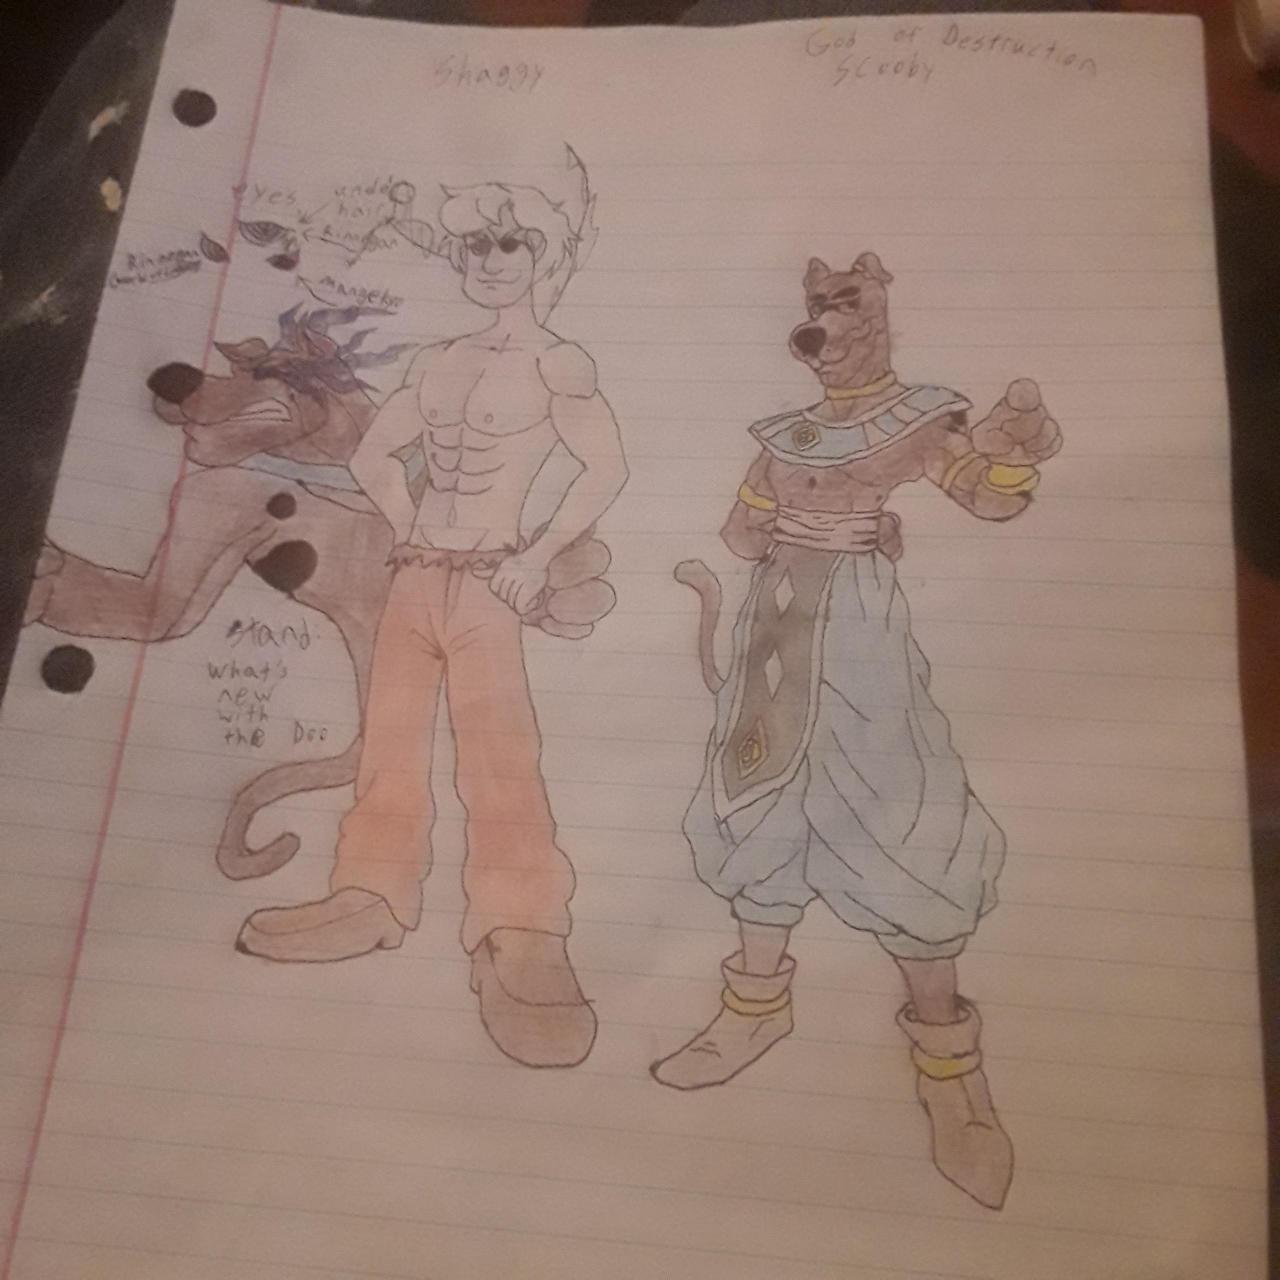 U.I. Shaggy and God of Destruction Scooby